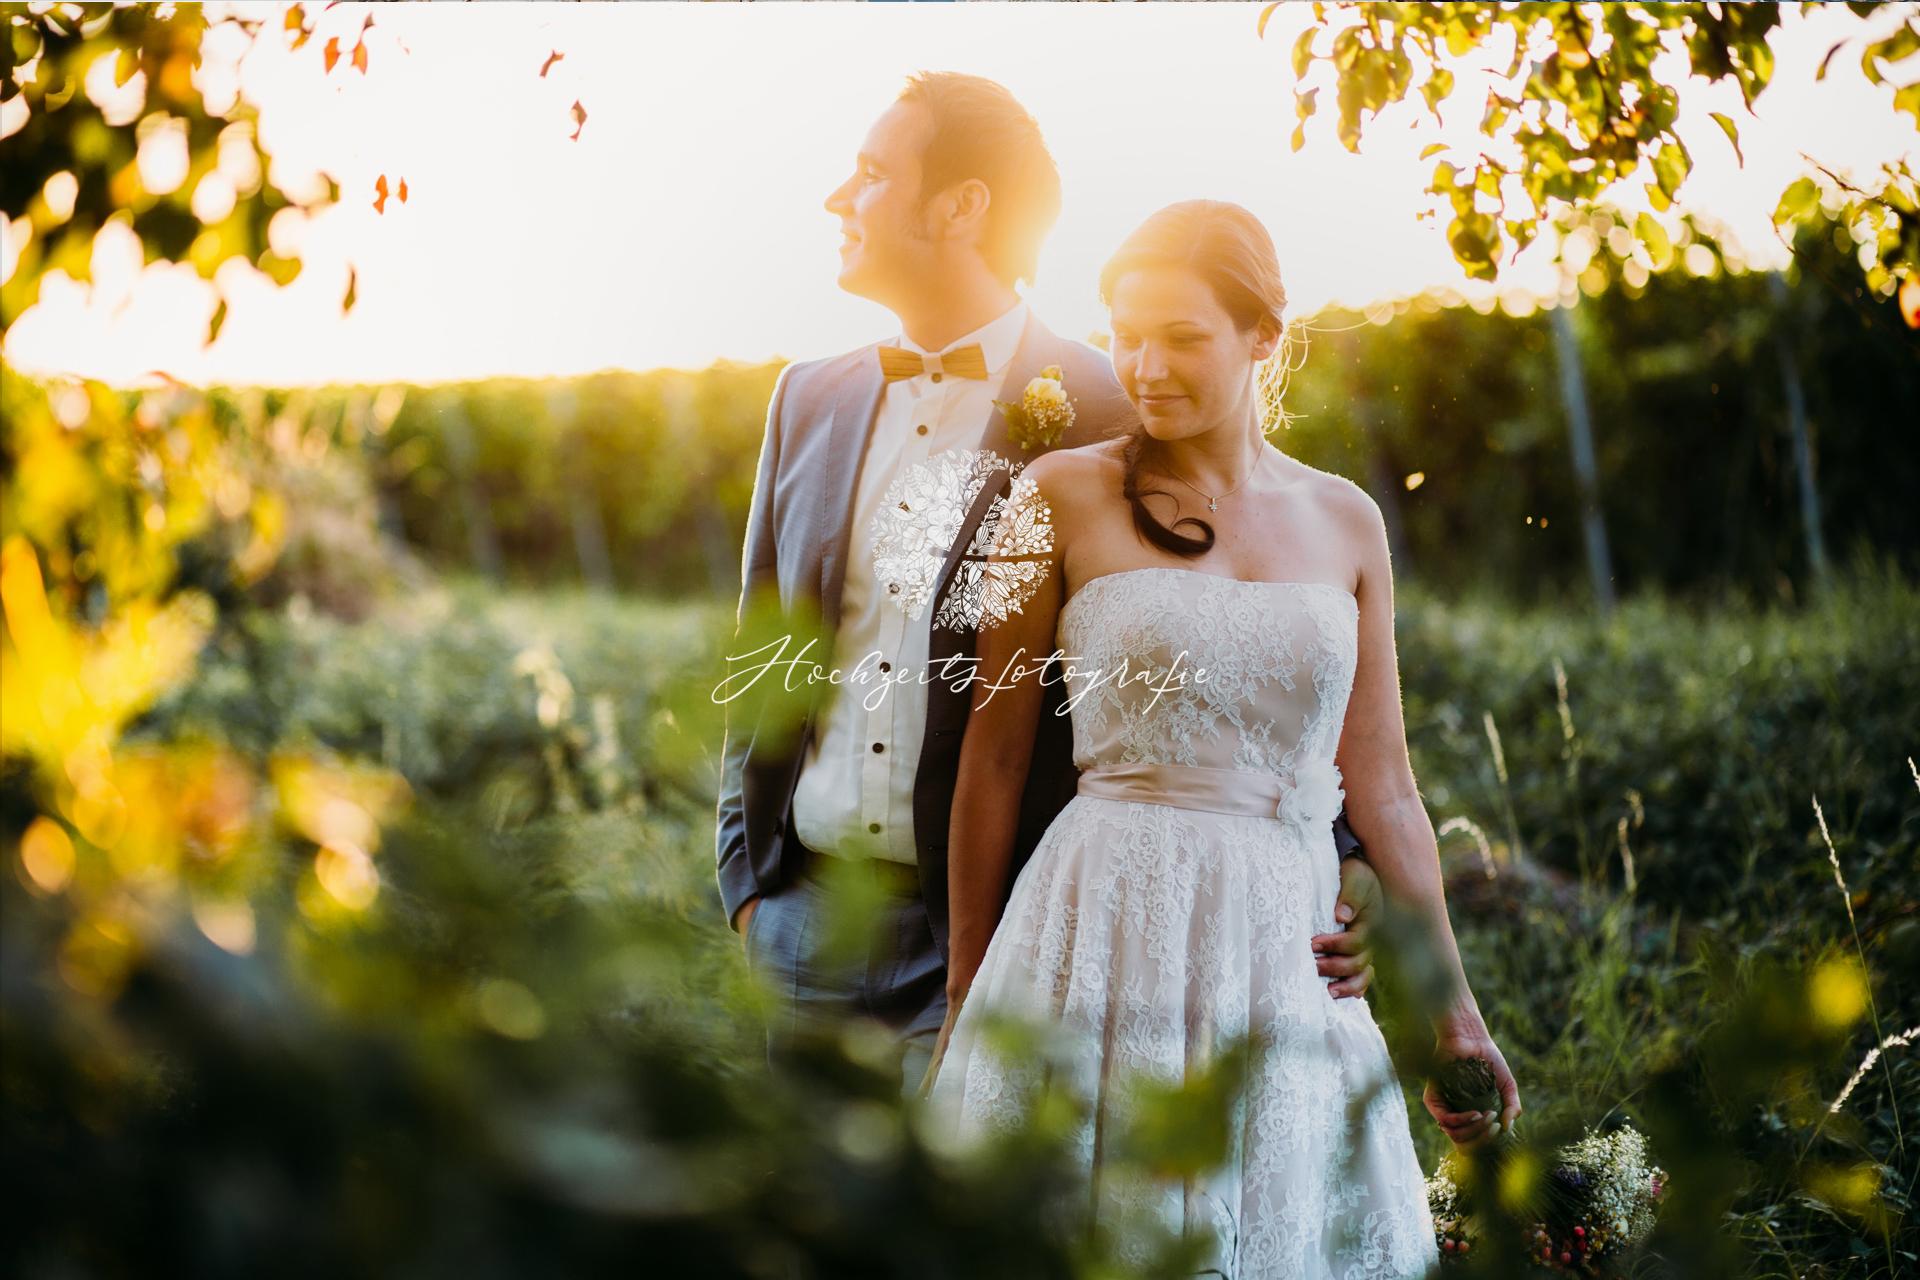 fotonen_Hochzeitsfotograf_leipzig-8-2